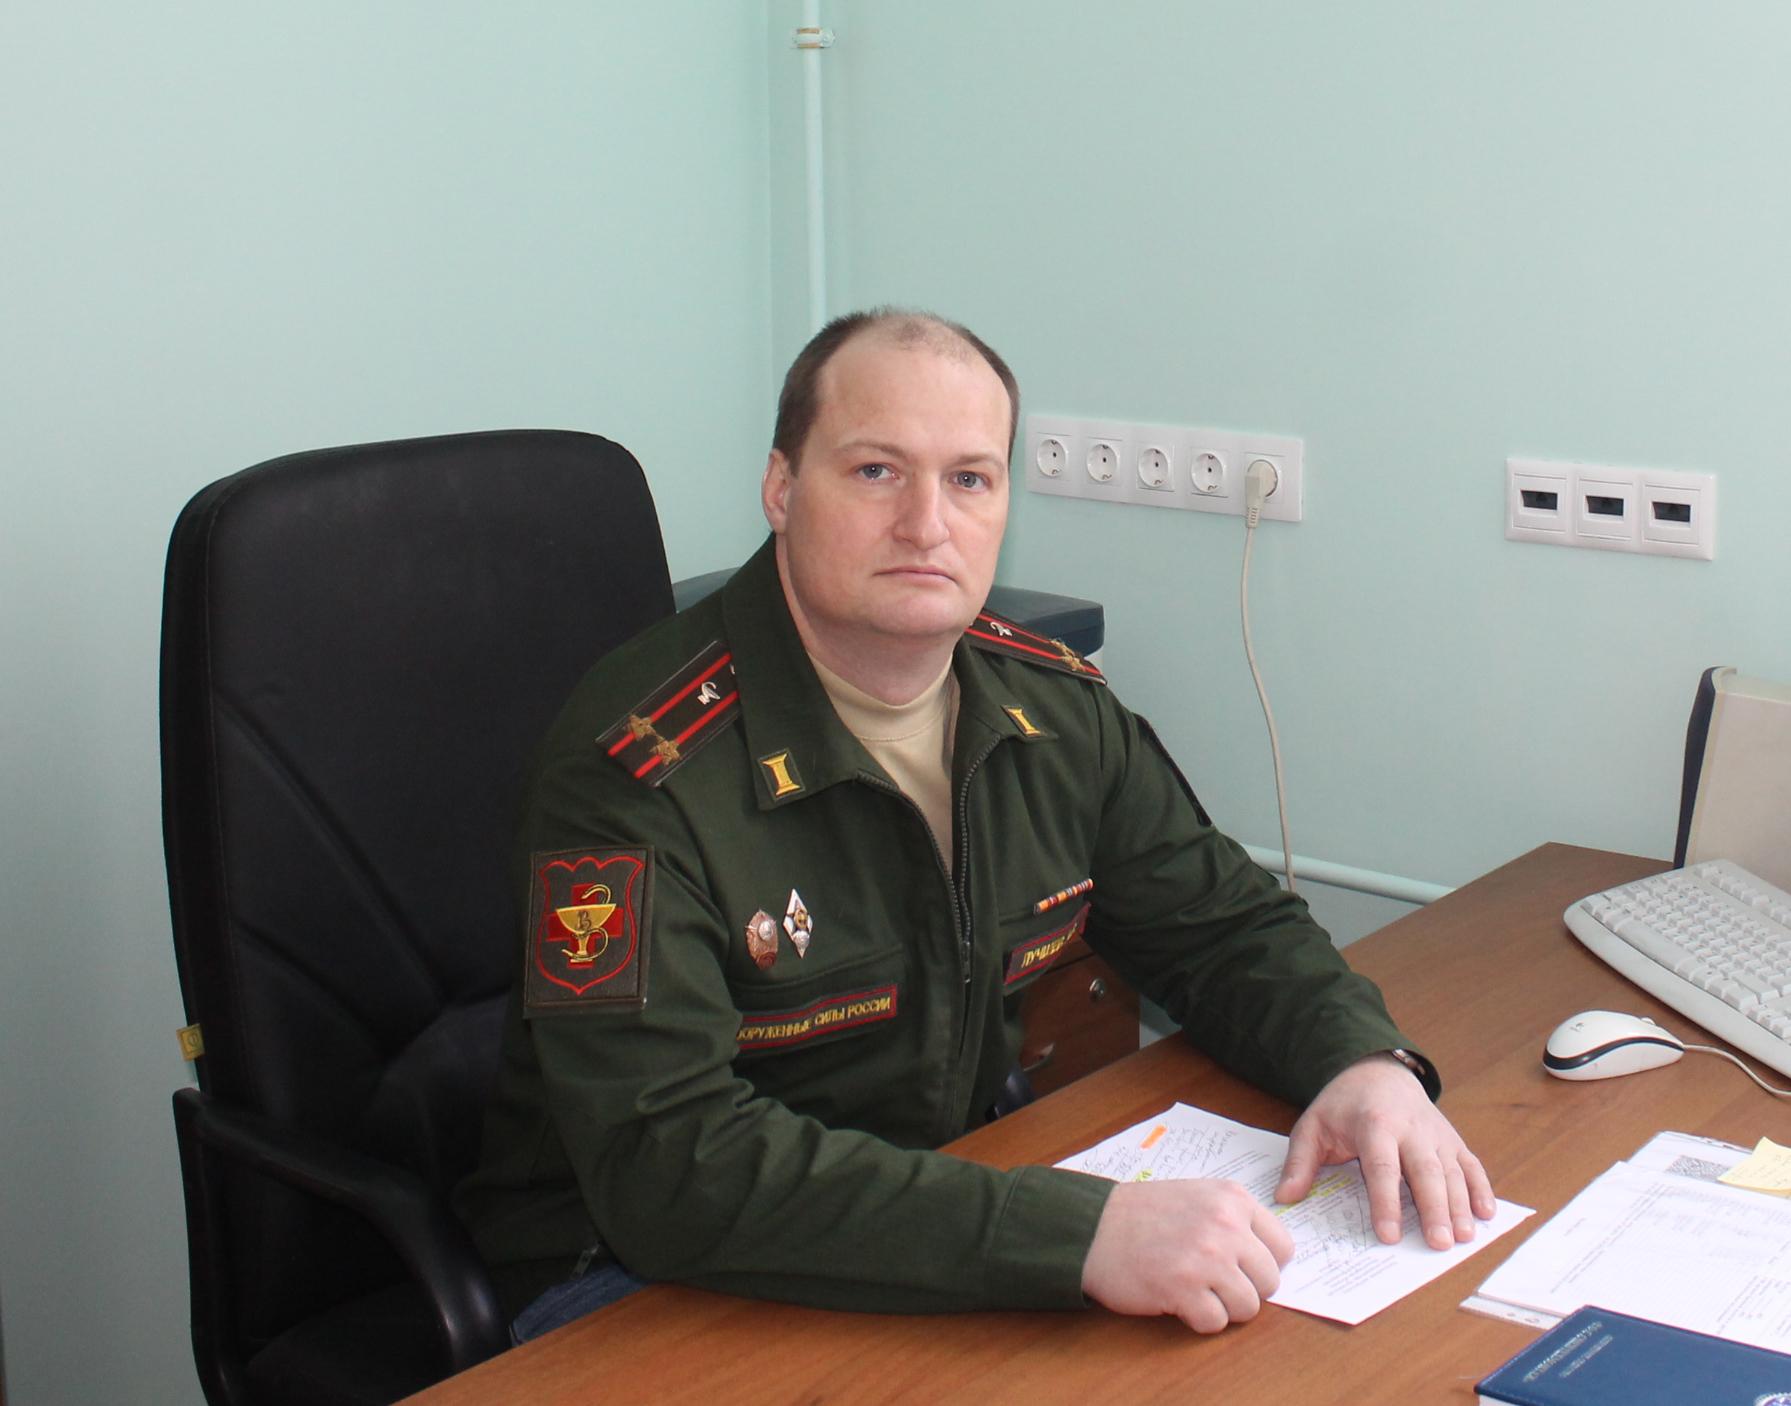 Лучшев Андрей Владиславович Image